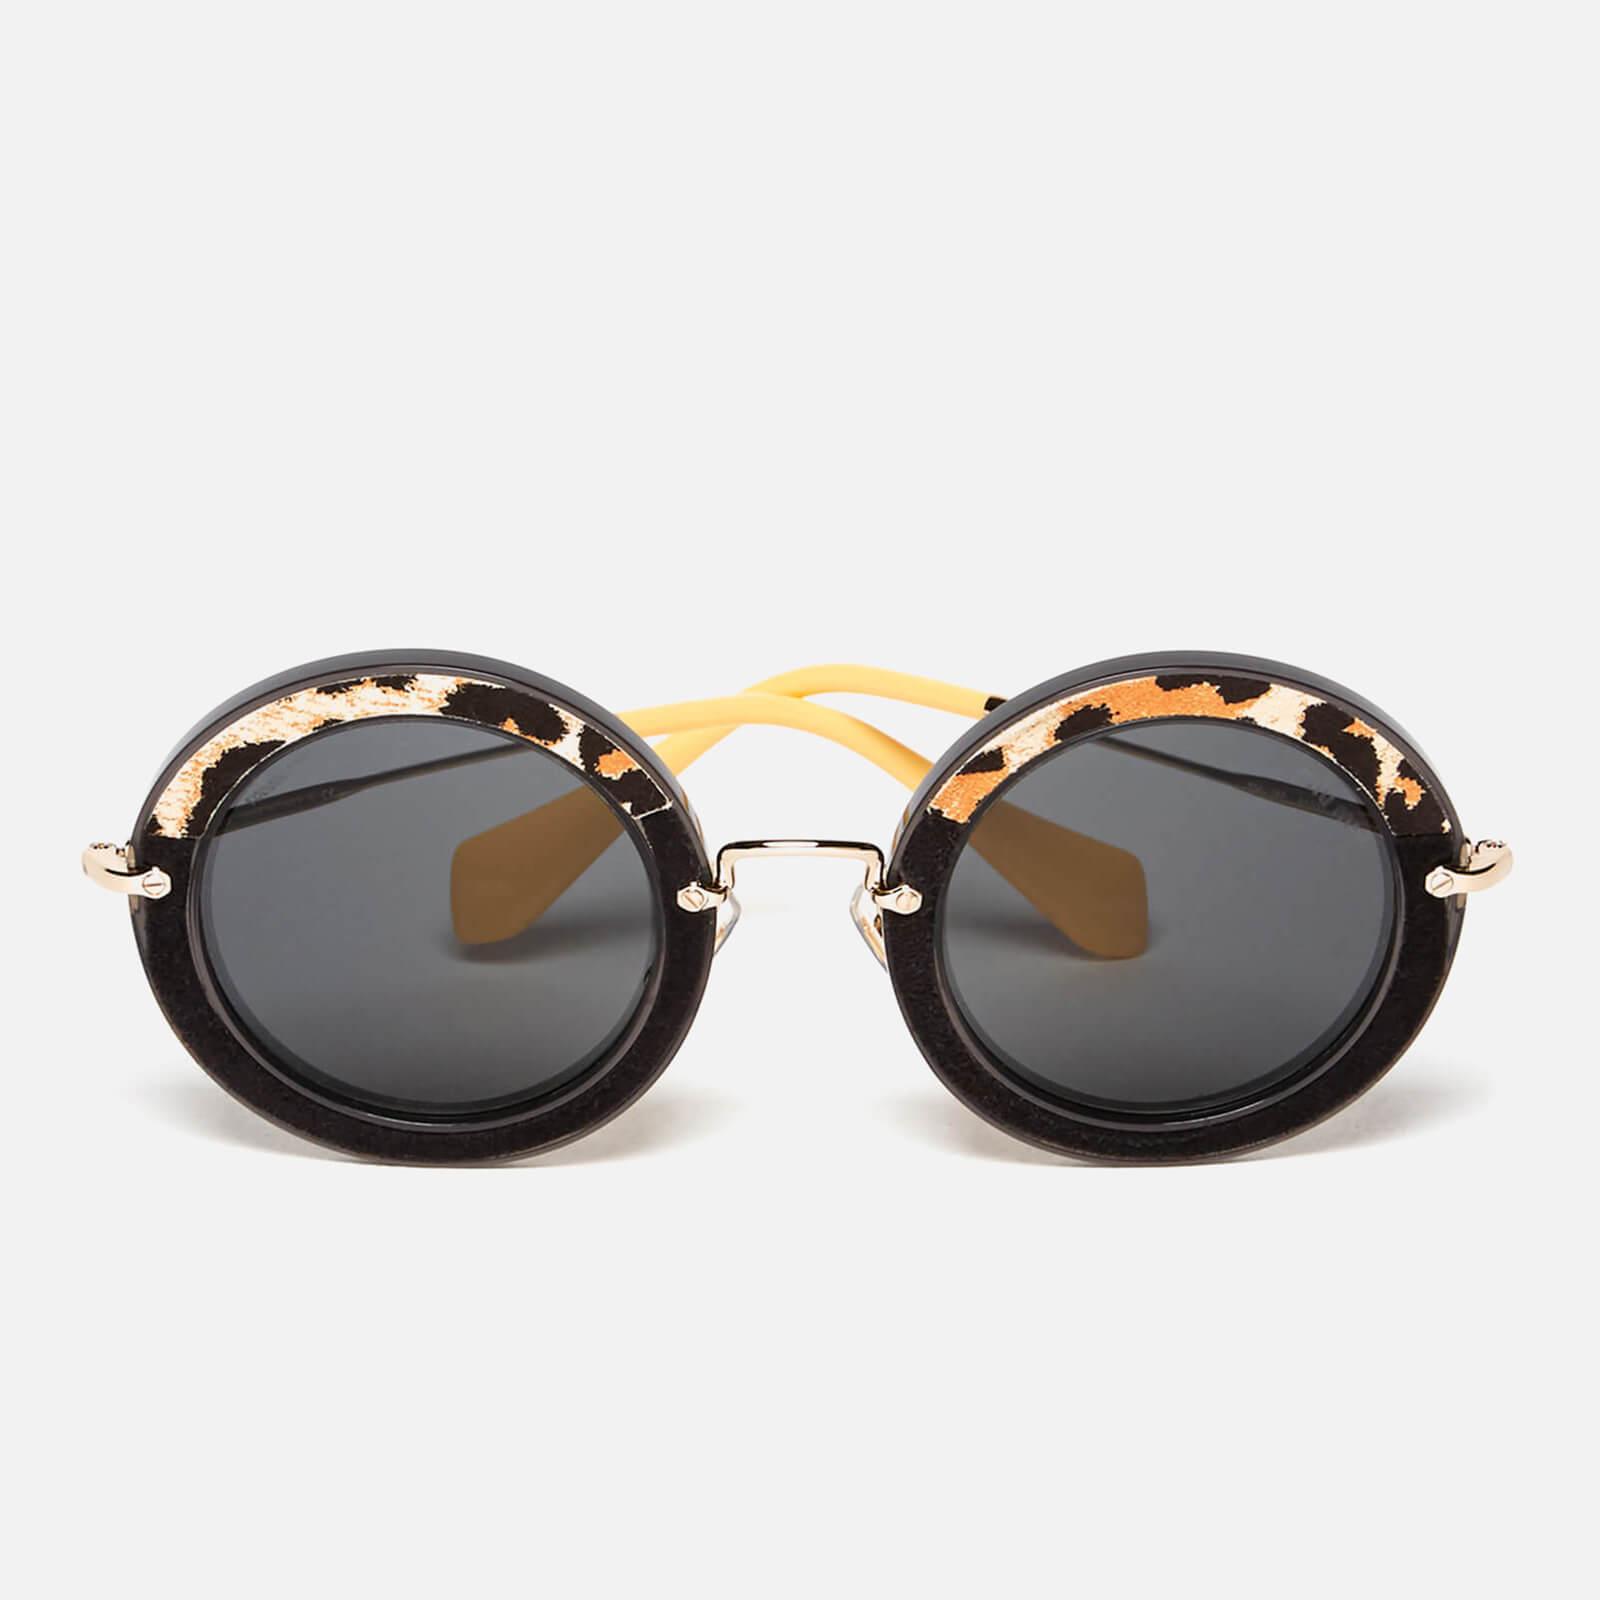 dc73c825ab Miu Miu Women s Round Oversized Sunglasses - Transparent Grey - Free UK  Delivery over £50